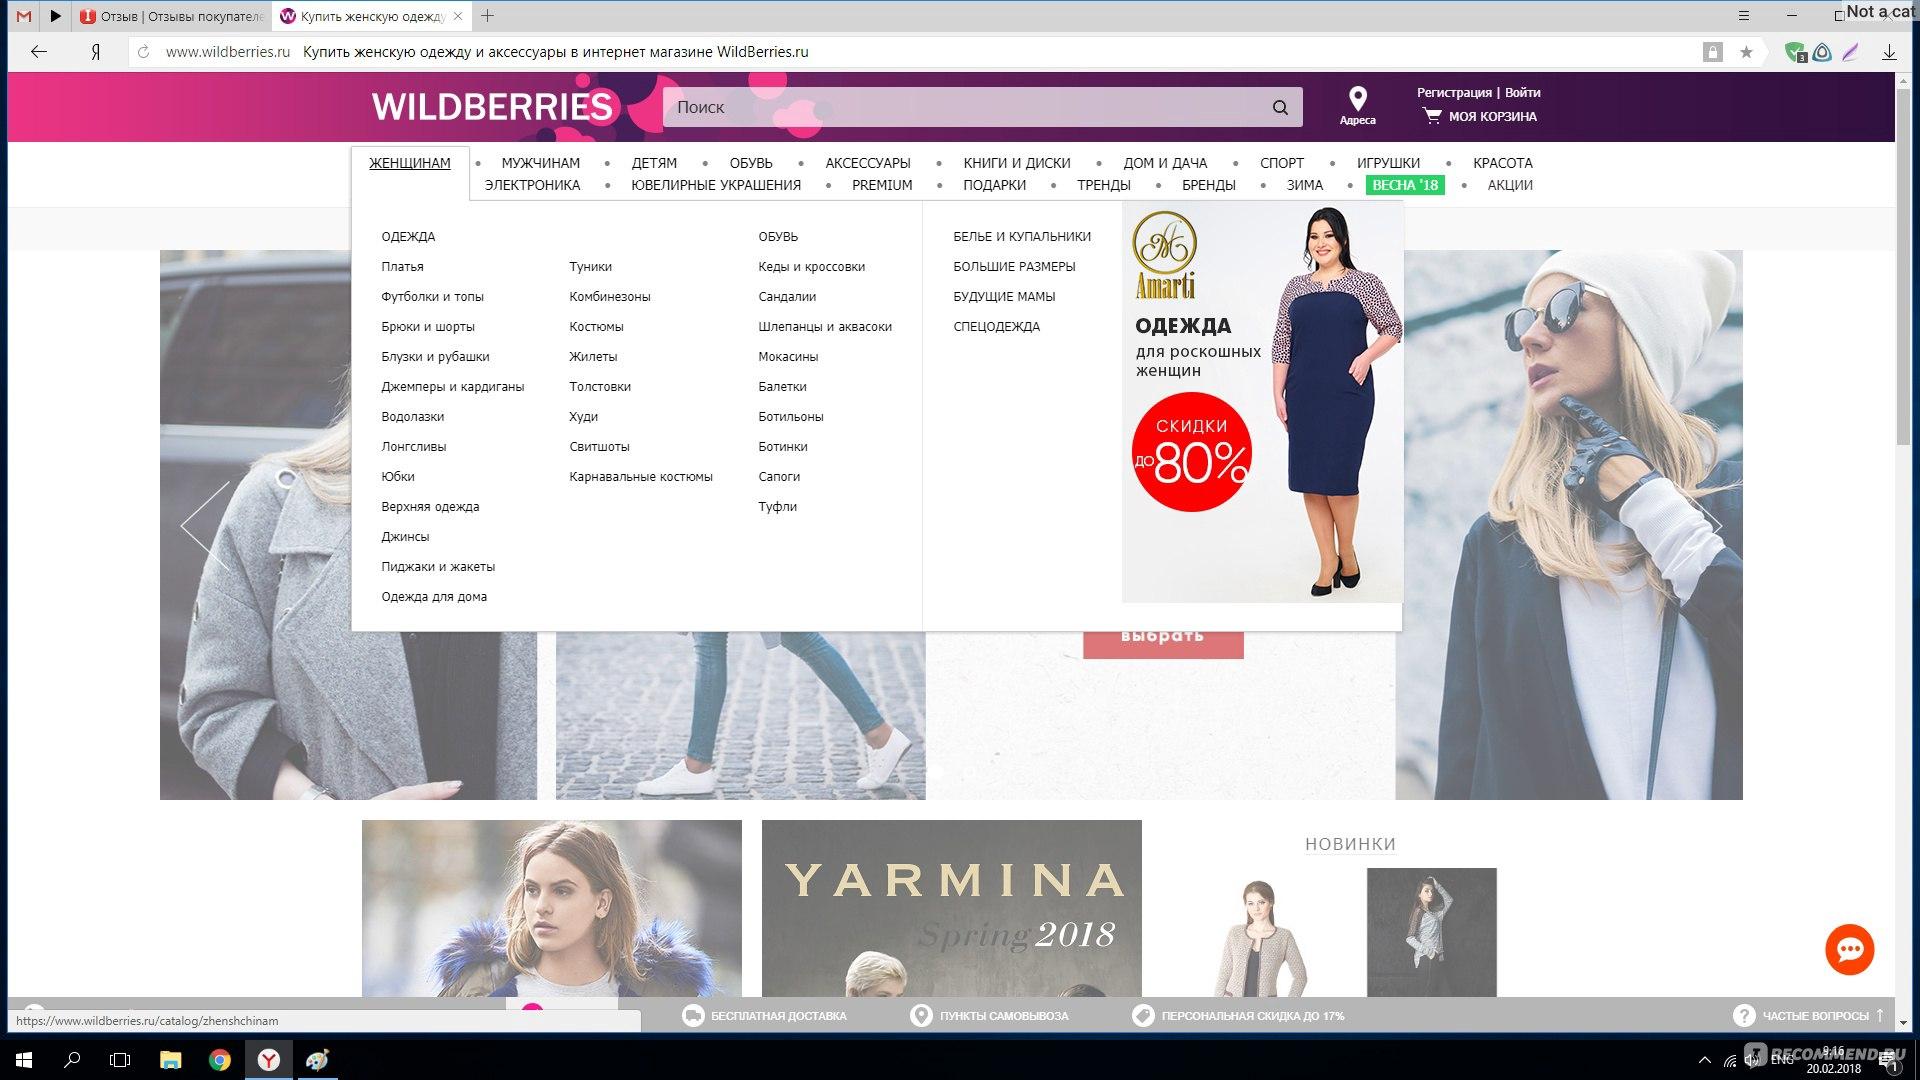 06eca81bafff Wildberries.ru - Интернет-магазин модной одежды и обуви фото